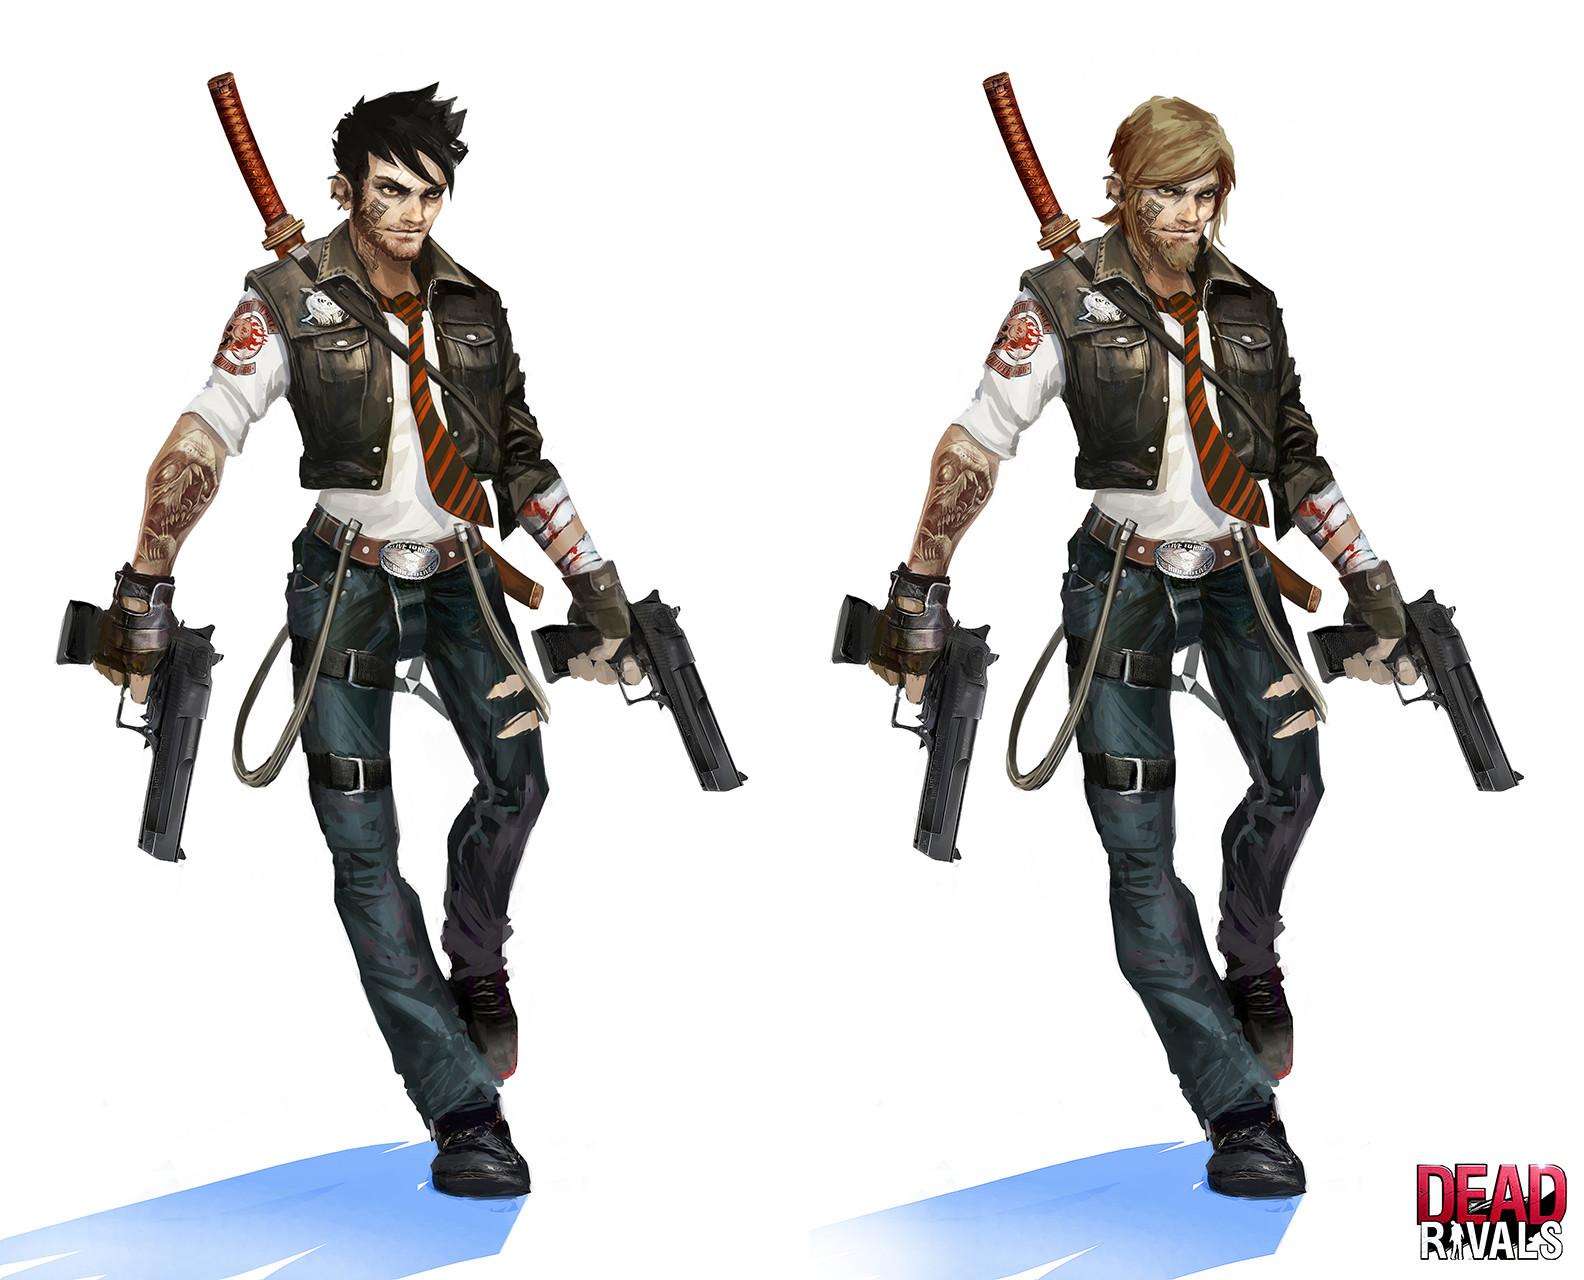 Alexandre chaudret zombiemmo character boy redesign06b